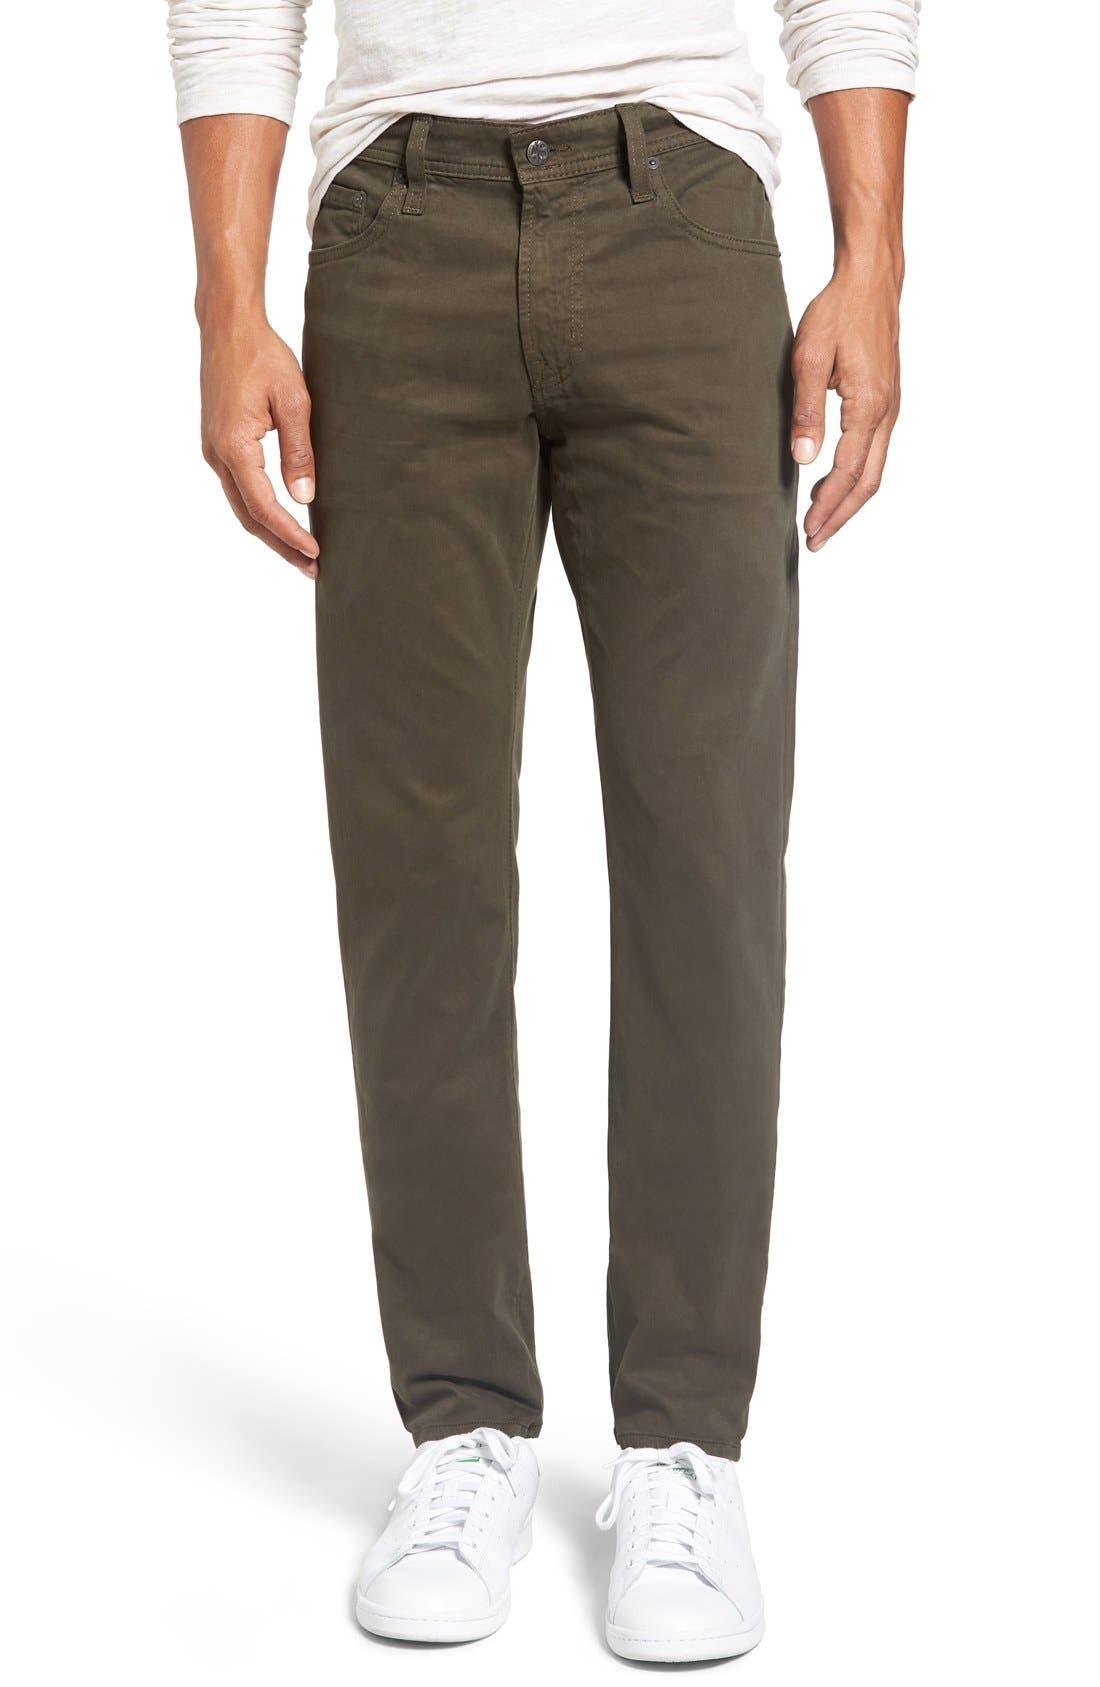 AG Dylan Slim Fit Pants